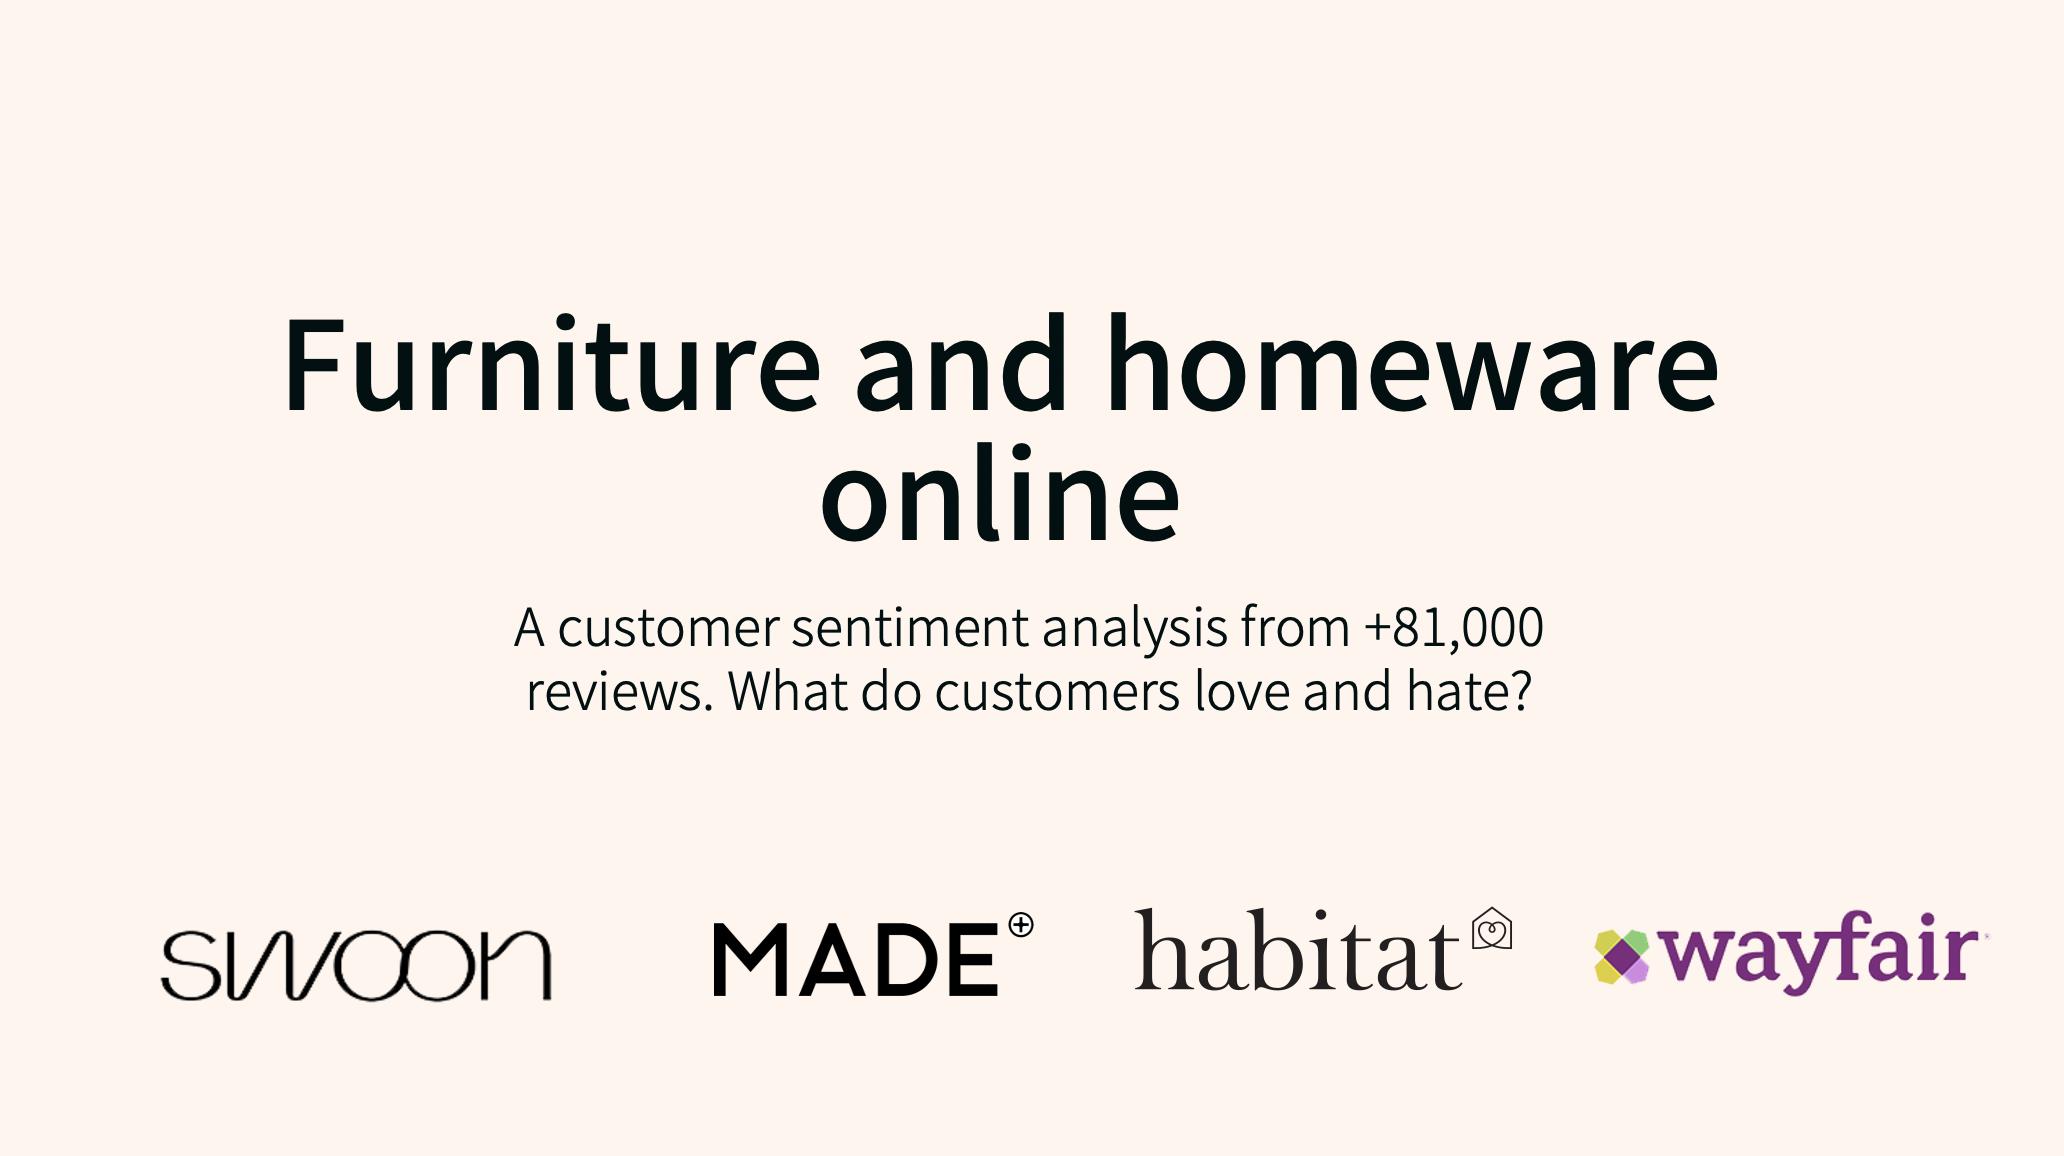 Online Furniture & Homeware: Customer Sentiment Analysis, 2020